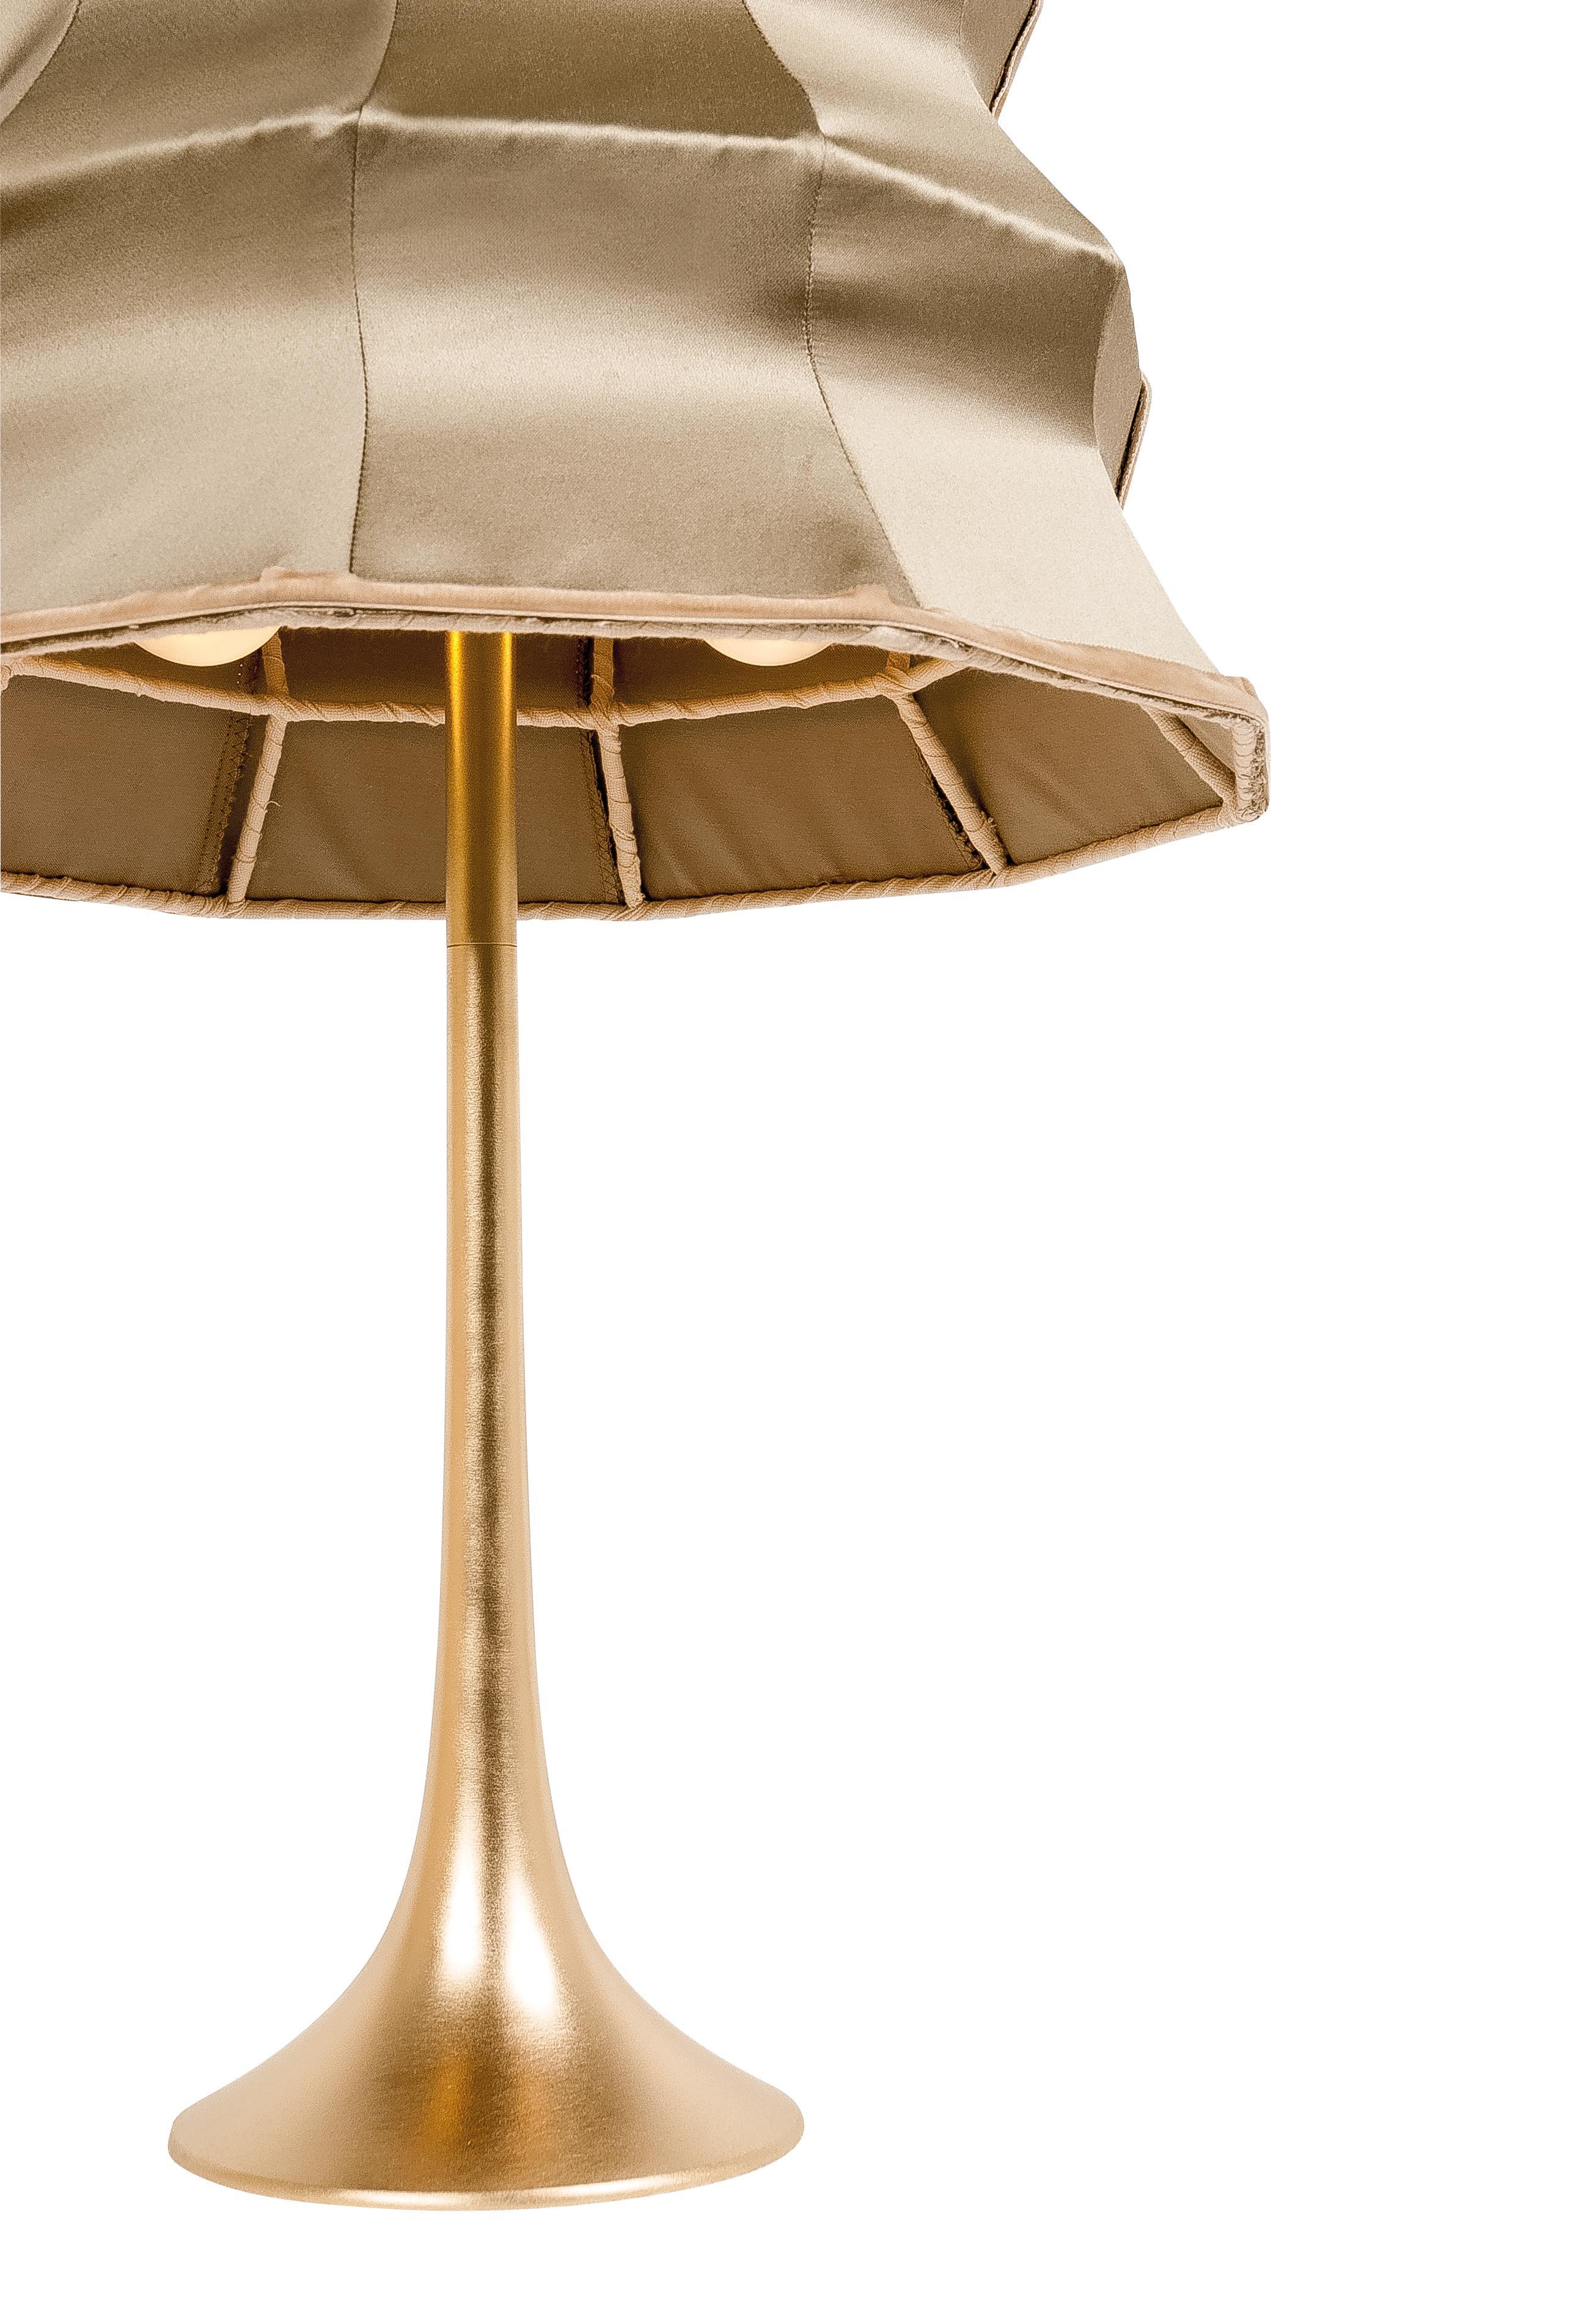 U201cPagodau201d Table Lamp, Cast Brass And Gold Silk, Silver Crystal Tip, Handmade